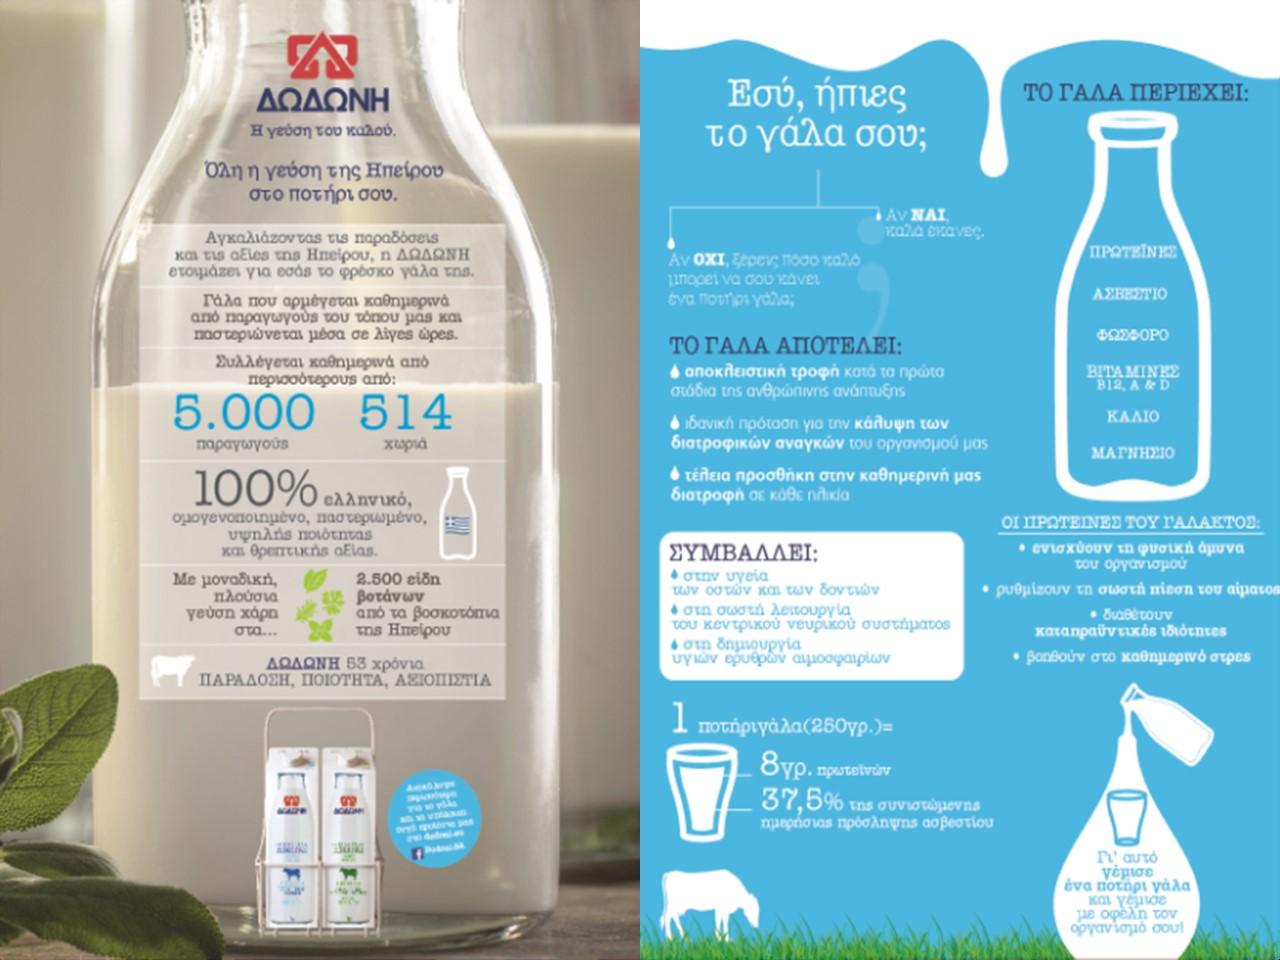 thumbnail_ΔΩΔΩΝΗ_Milk Infographic